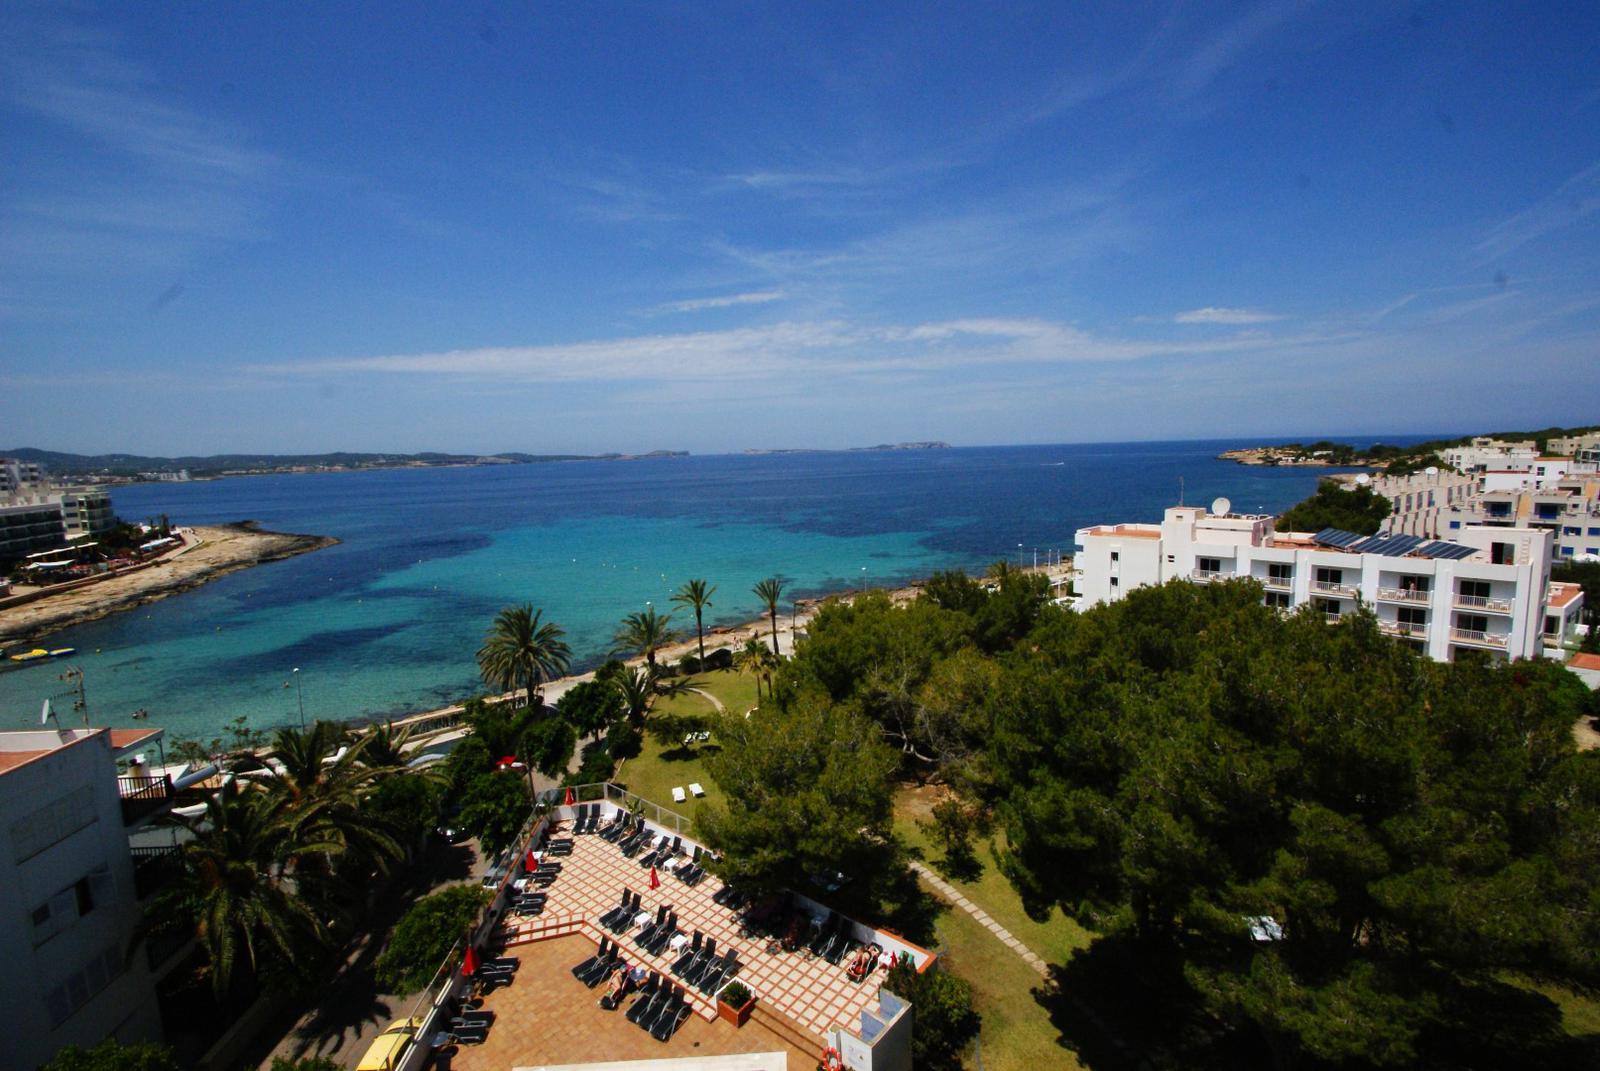 hoteles playa ibiza exterior2 (Large)